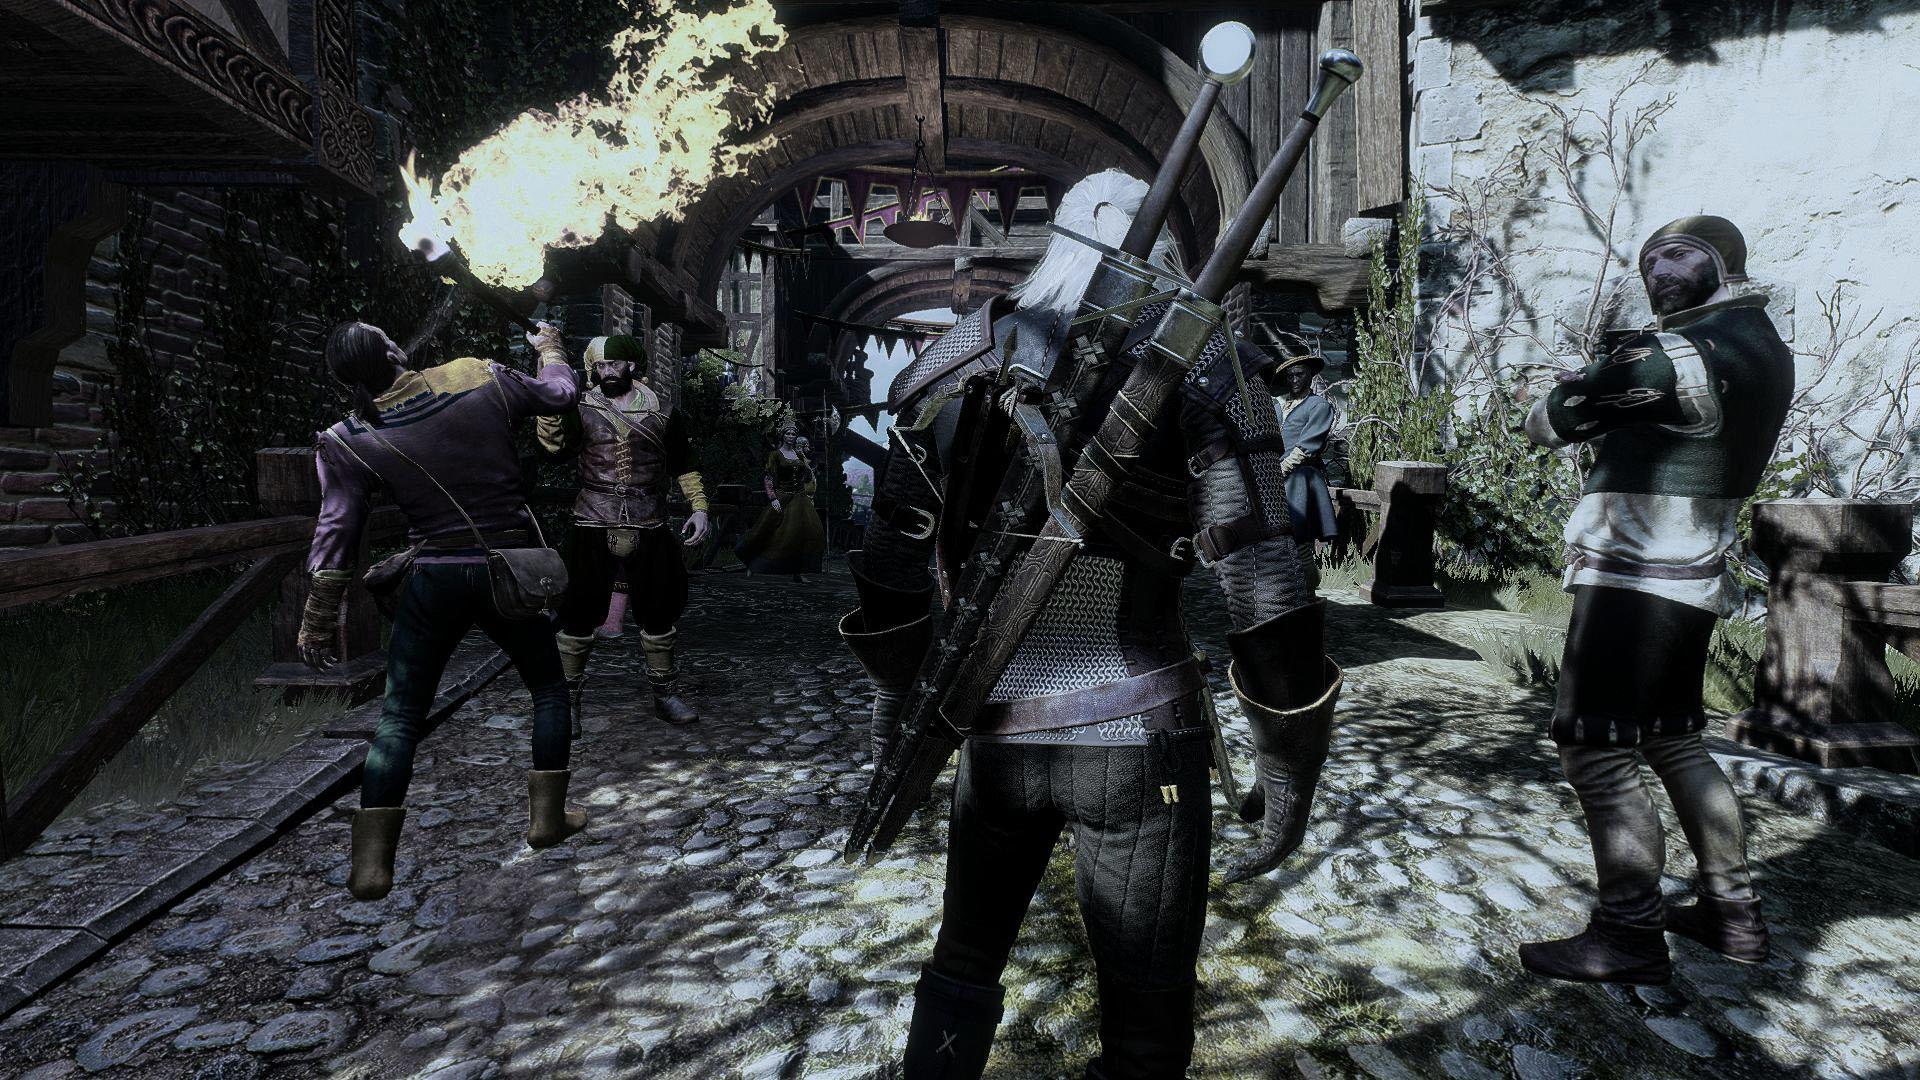 witcher3 2021-10-12 18-44-30-41е.jpg - The Witcher 3: Wild Hunt